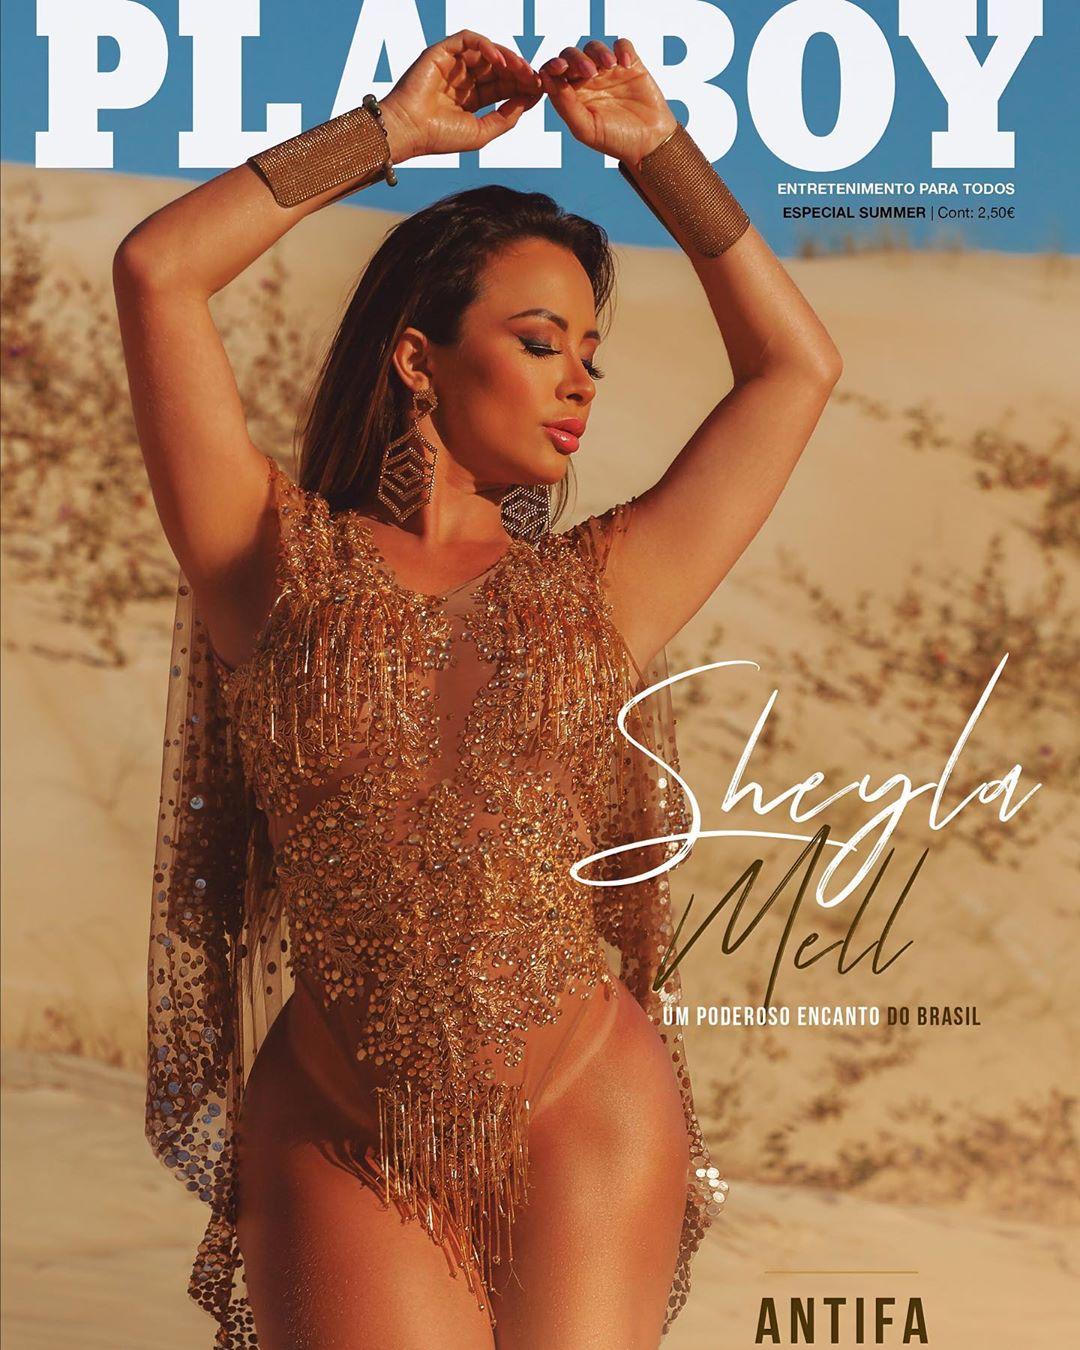 Capa da Playboy Portugal de julho, Sheyla Mell bate recorde de ensaio nu